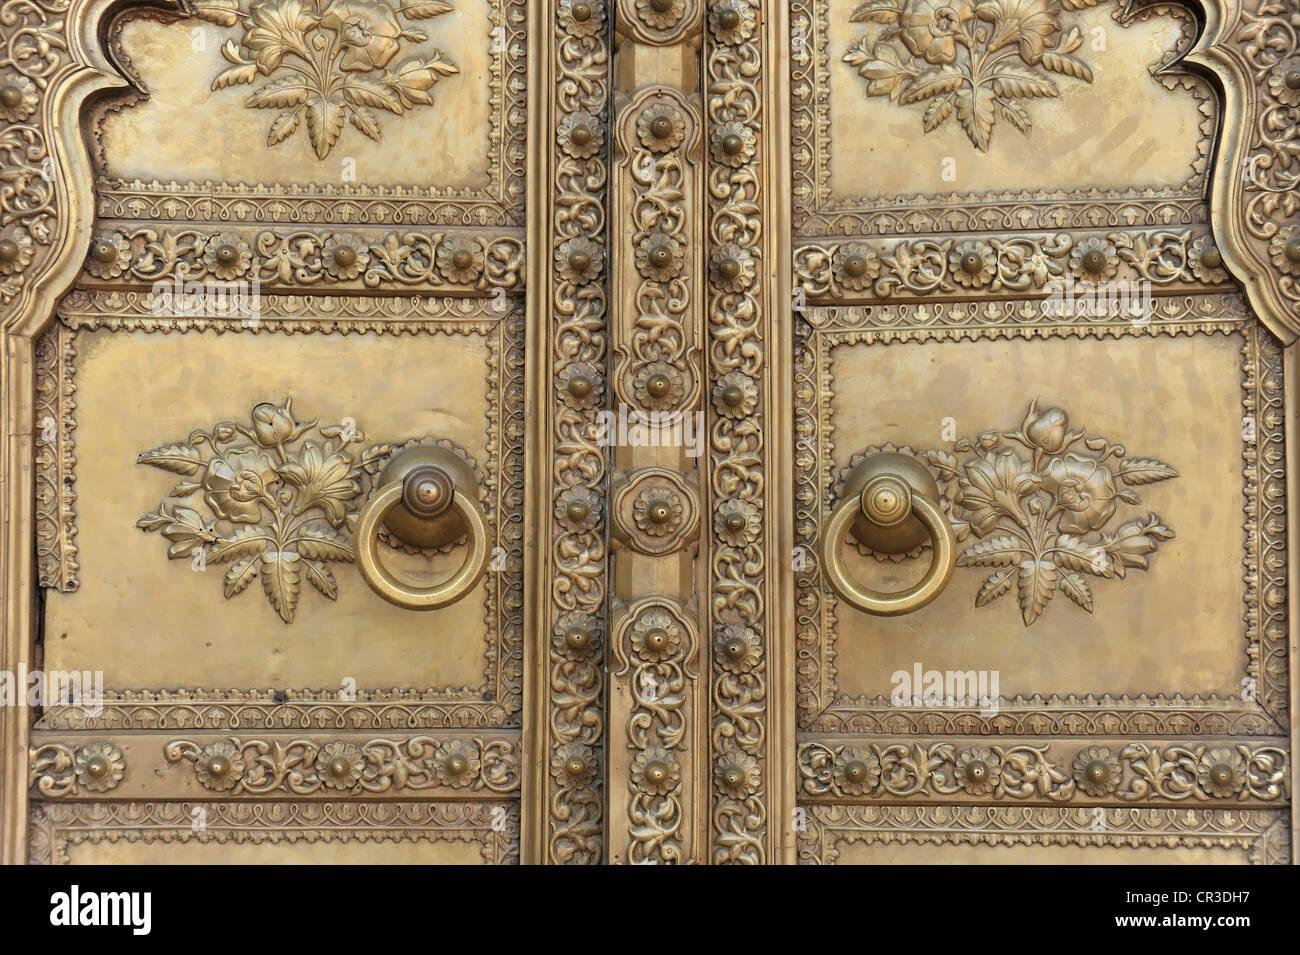 Detail, entrance door, Chandra Mahal city palace, Jaipur, Rajasthan, North India, India, South Asia, Asia - Stock Image